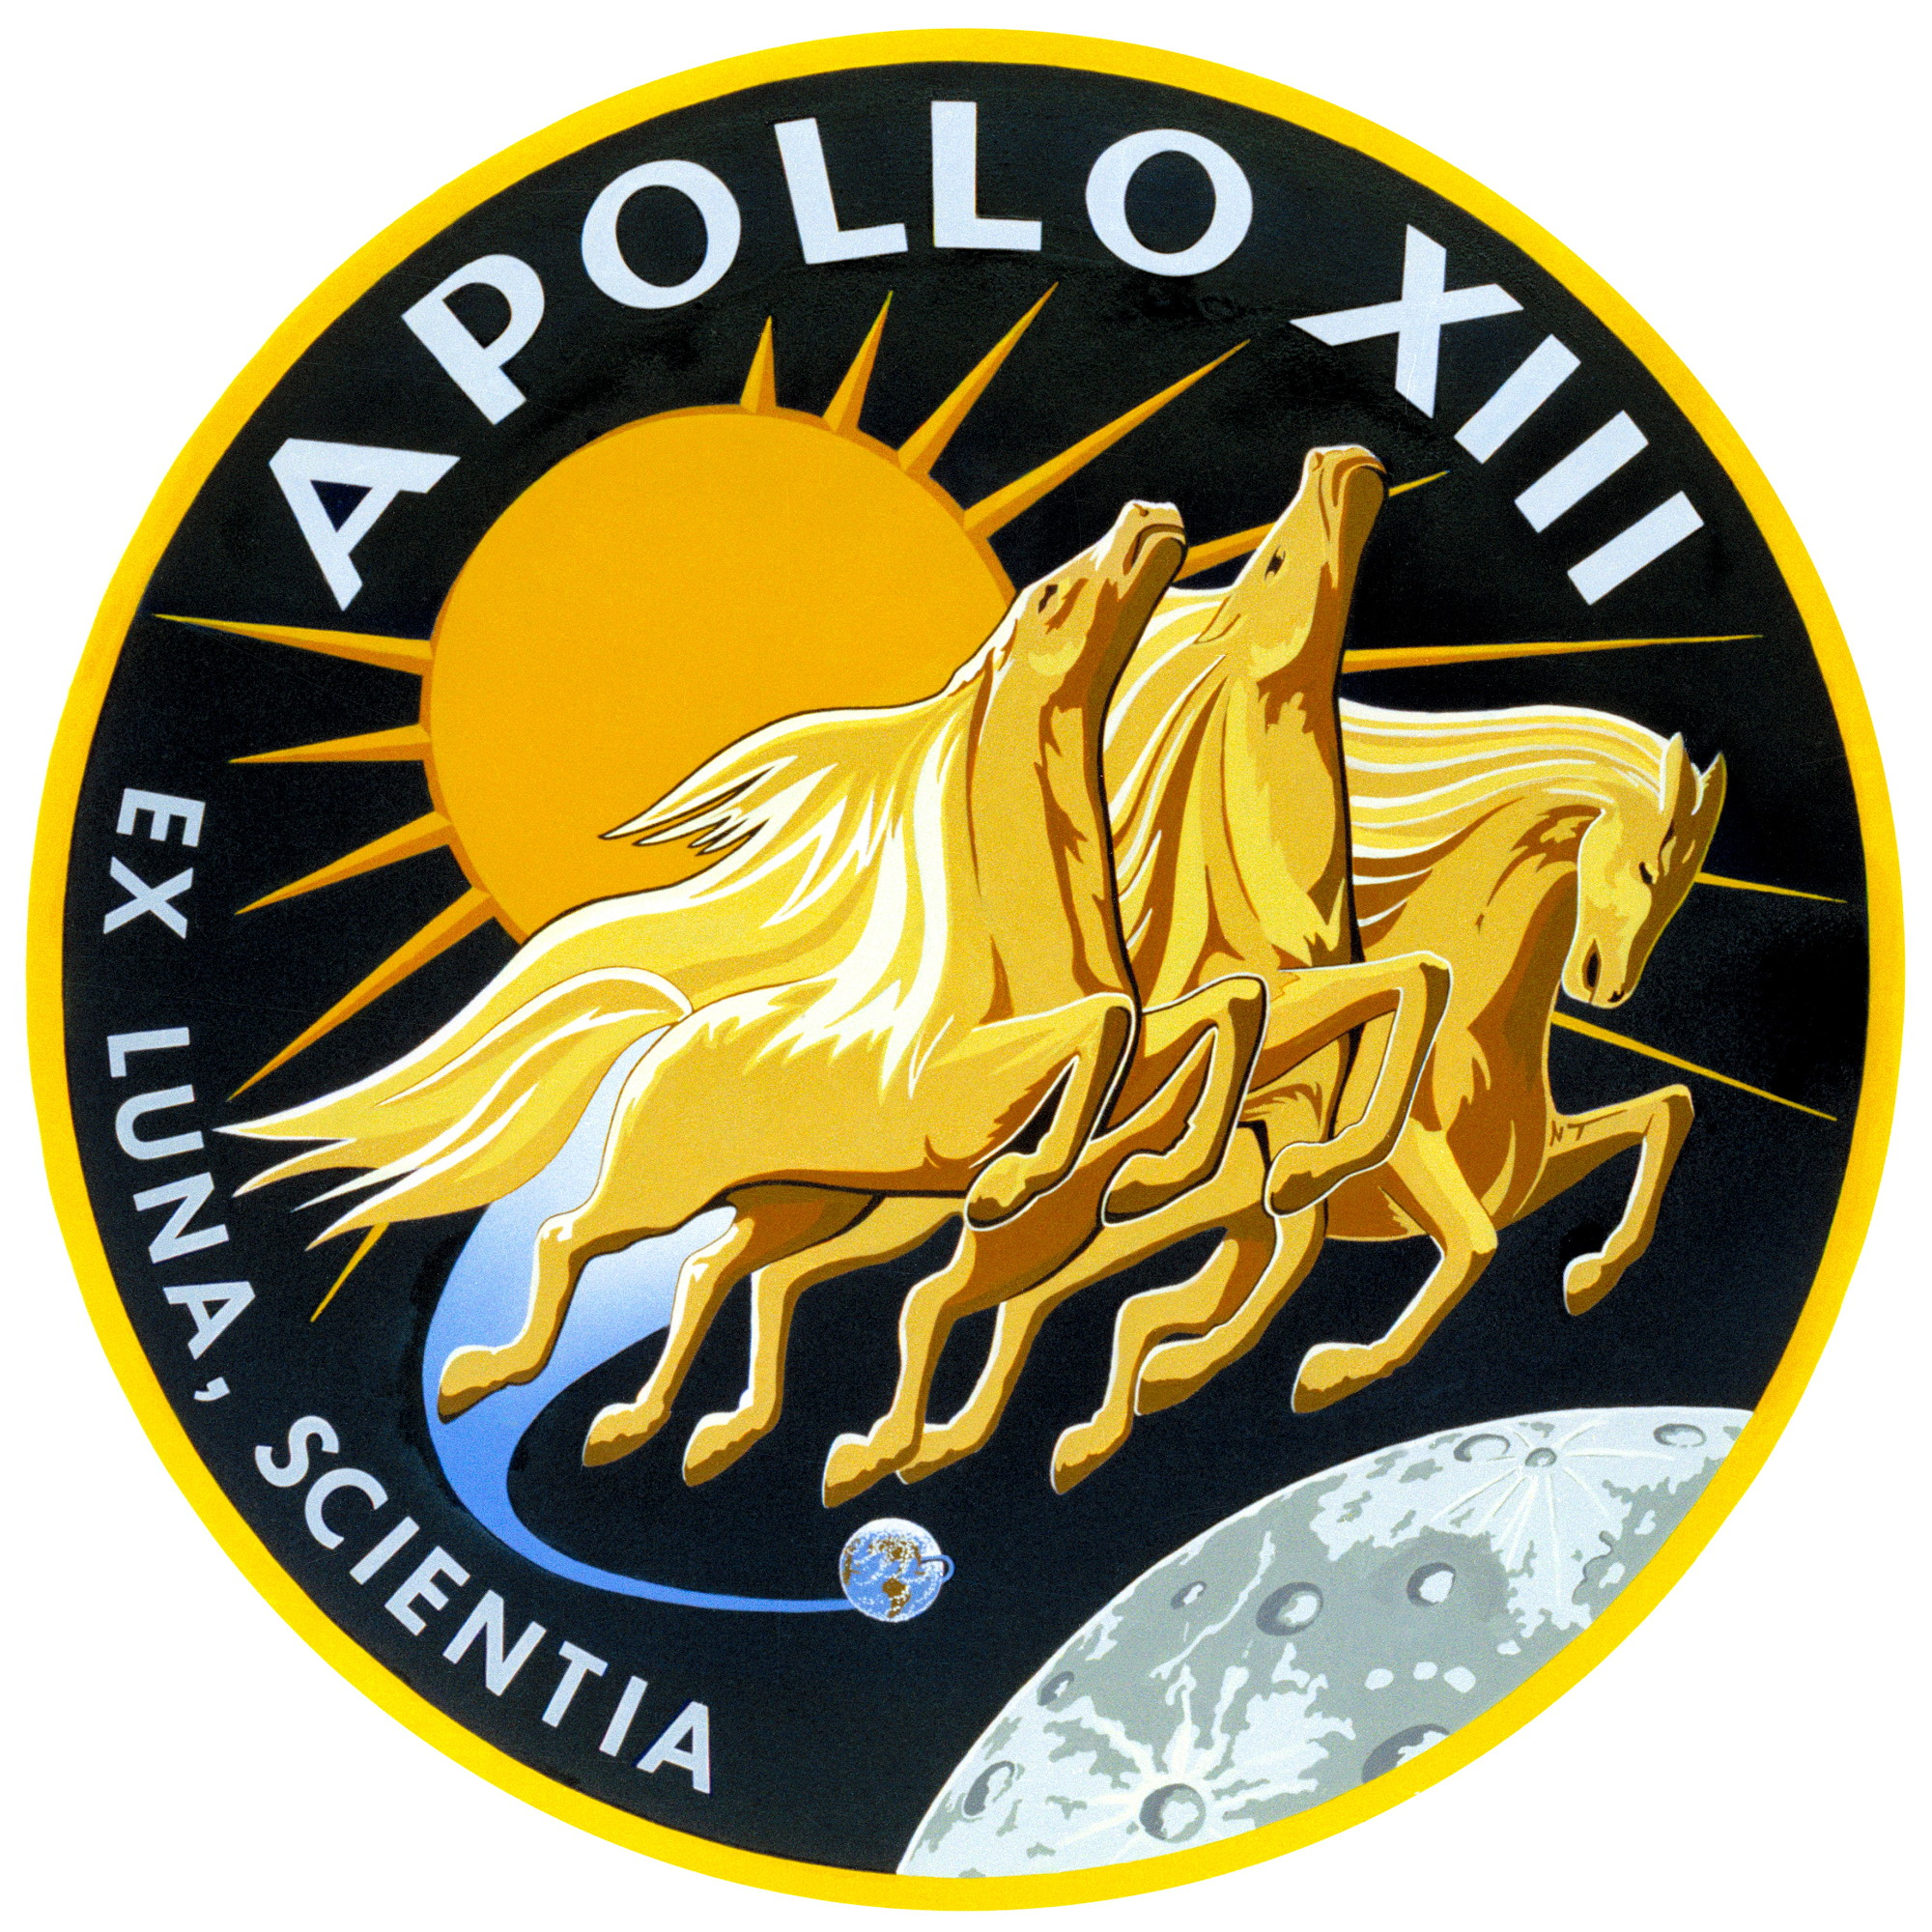 apollo missions name - photo #17